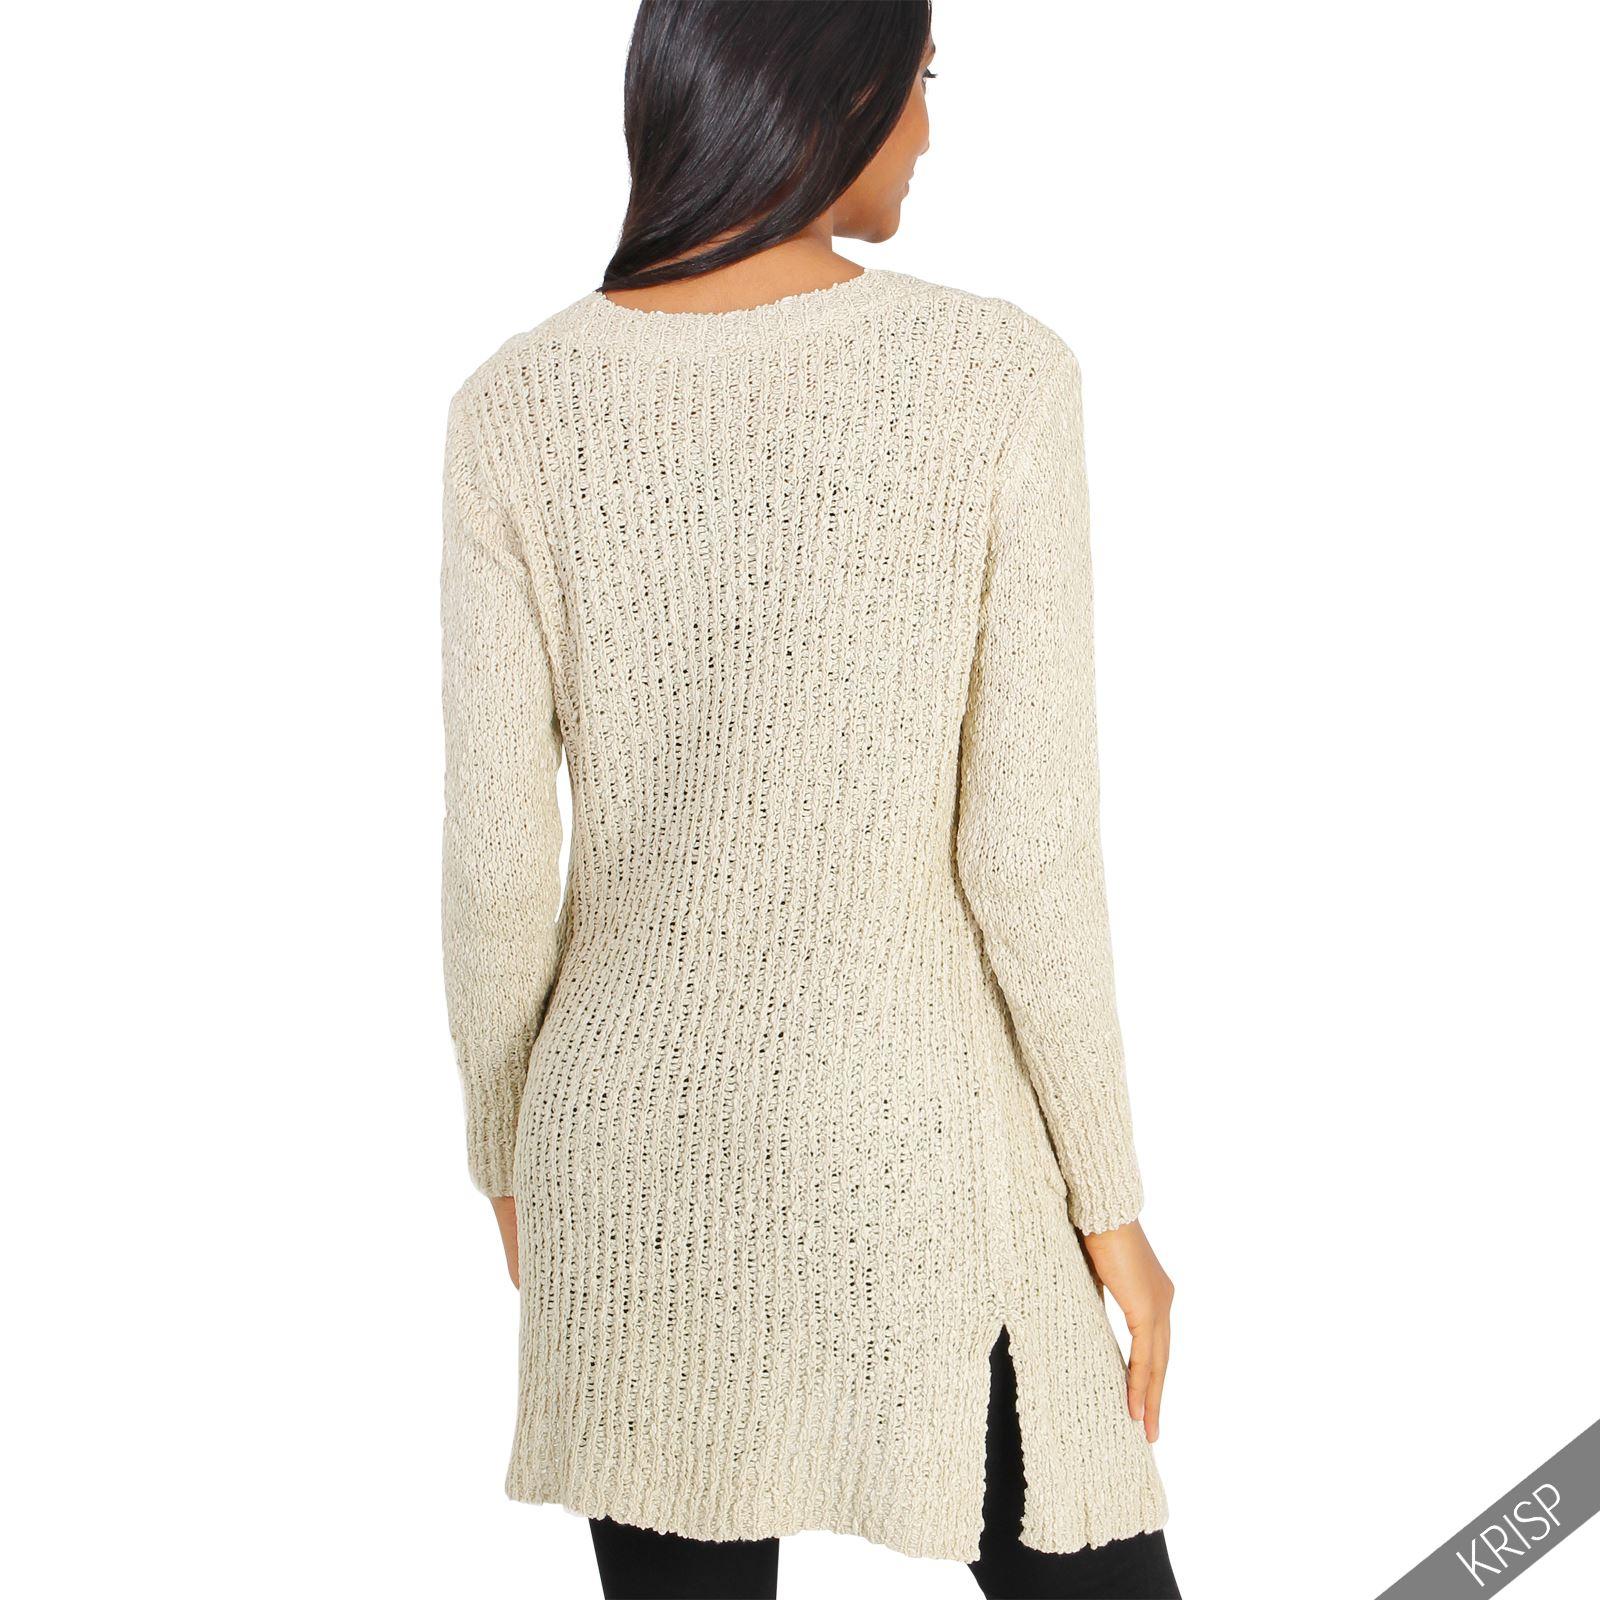 Femmes cardigan manches longues gilet long maille epais pull tricot tendance ebay - Cardigan long femme ...